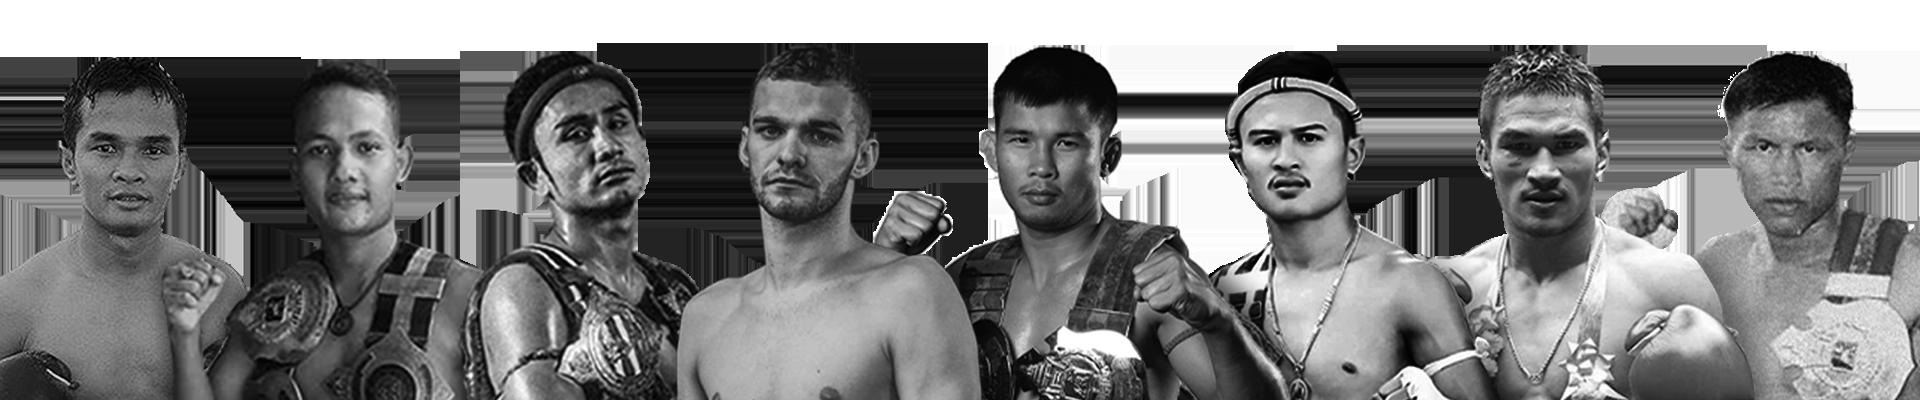 Muay Thai Fundamentals Featured World Champions